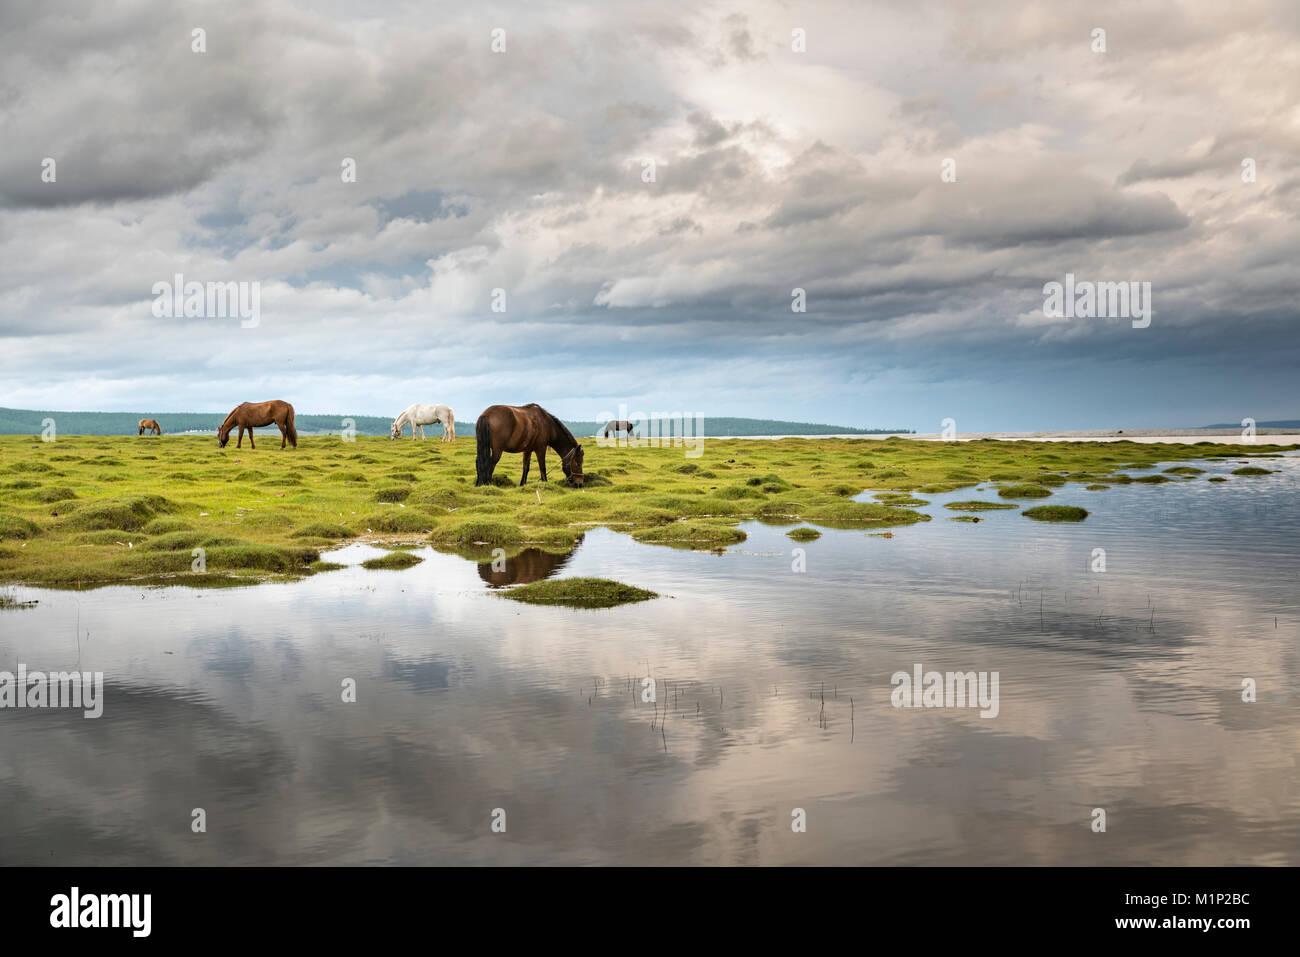 Caballos que pastan en las orillas del Lago Hovsgol, provincia Hovsgol, Mongolia, Asia Central, África Imagen De Stock